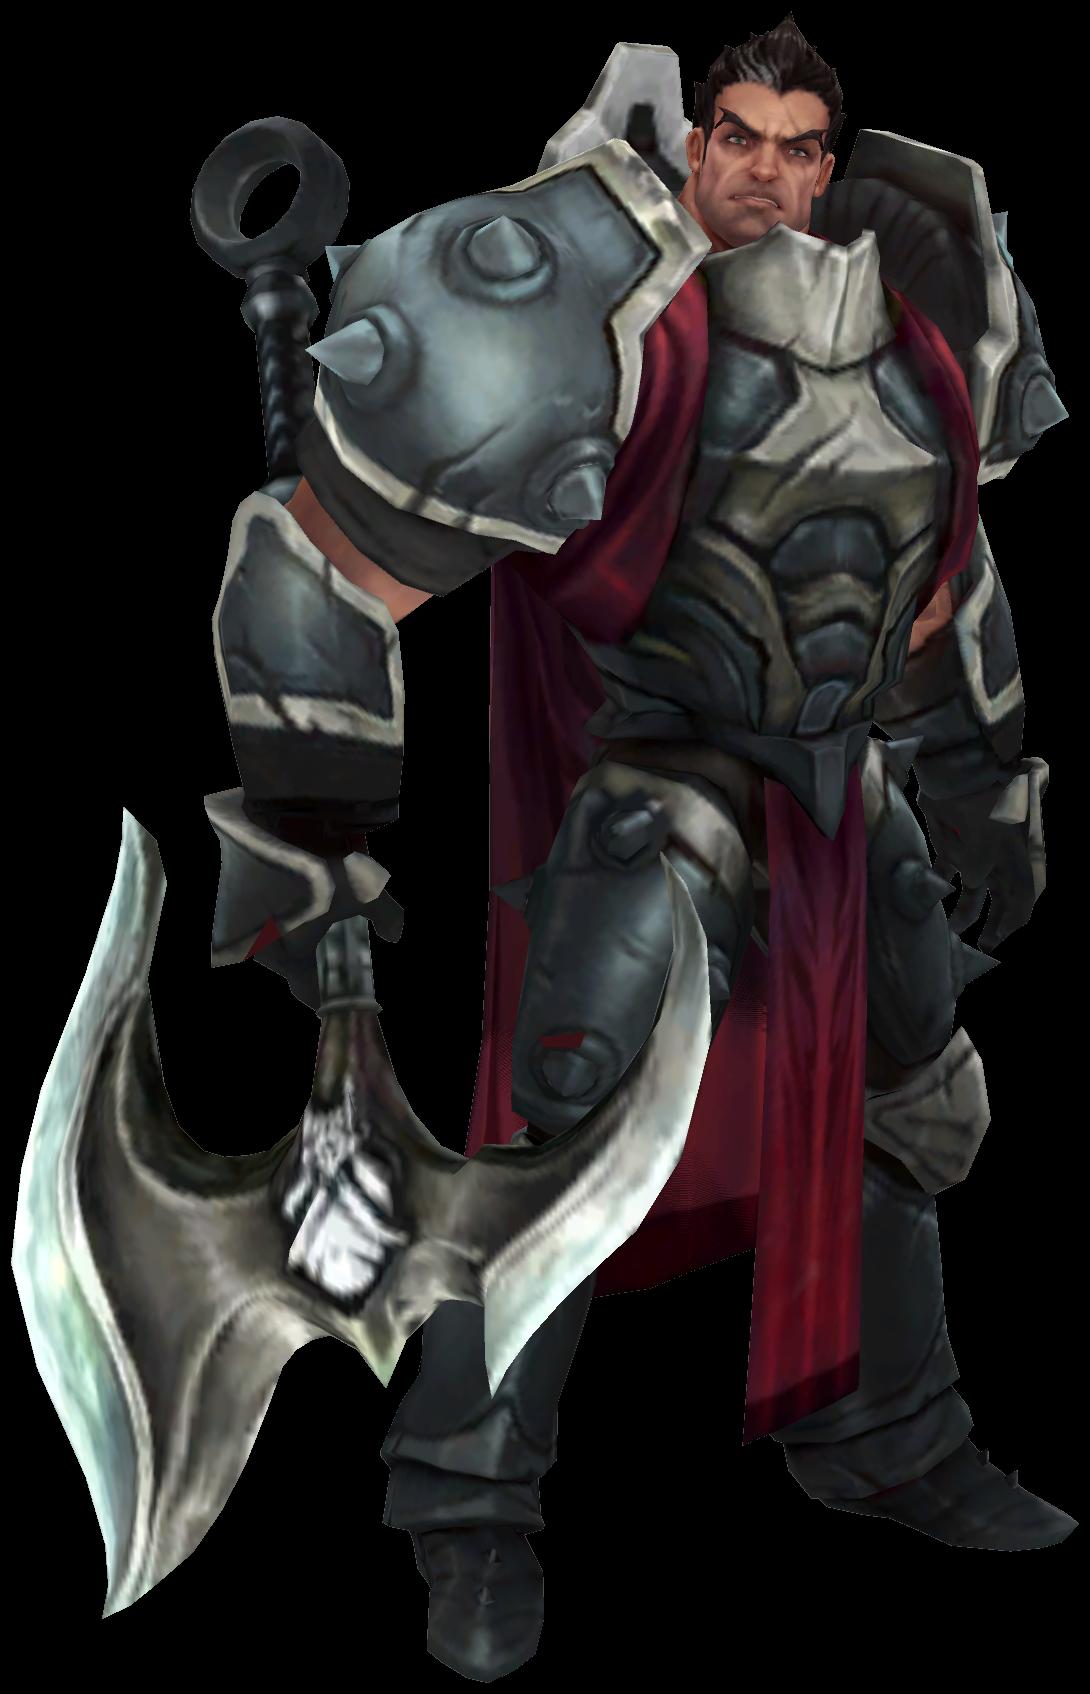 Image - Darius Render.png - League of Legends Wiki - Wikia